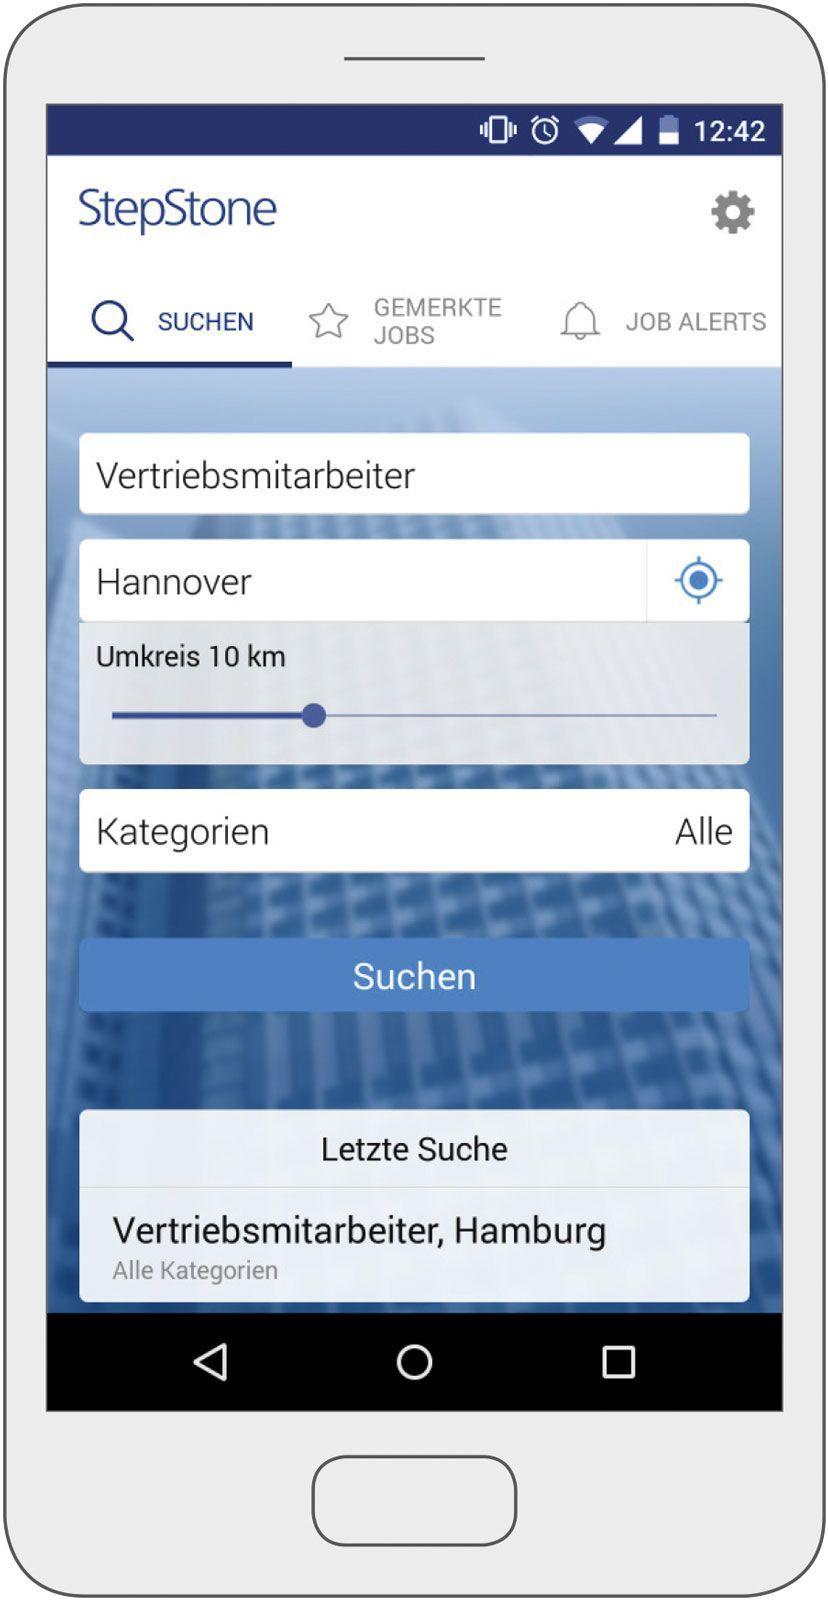 Technik_Jobsuche_per_Smartphone_0615